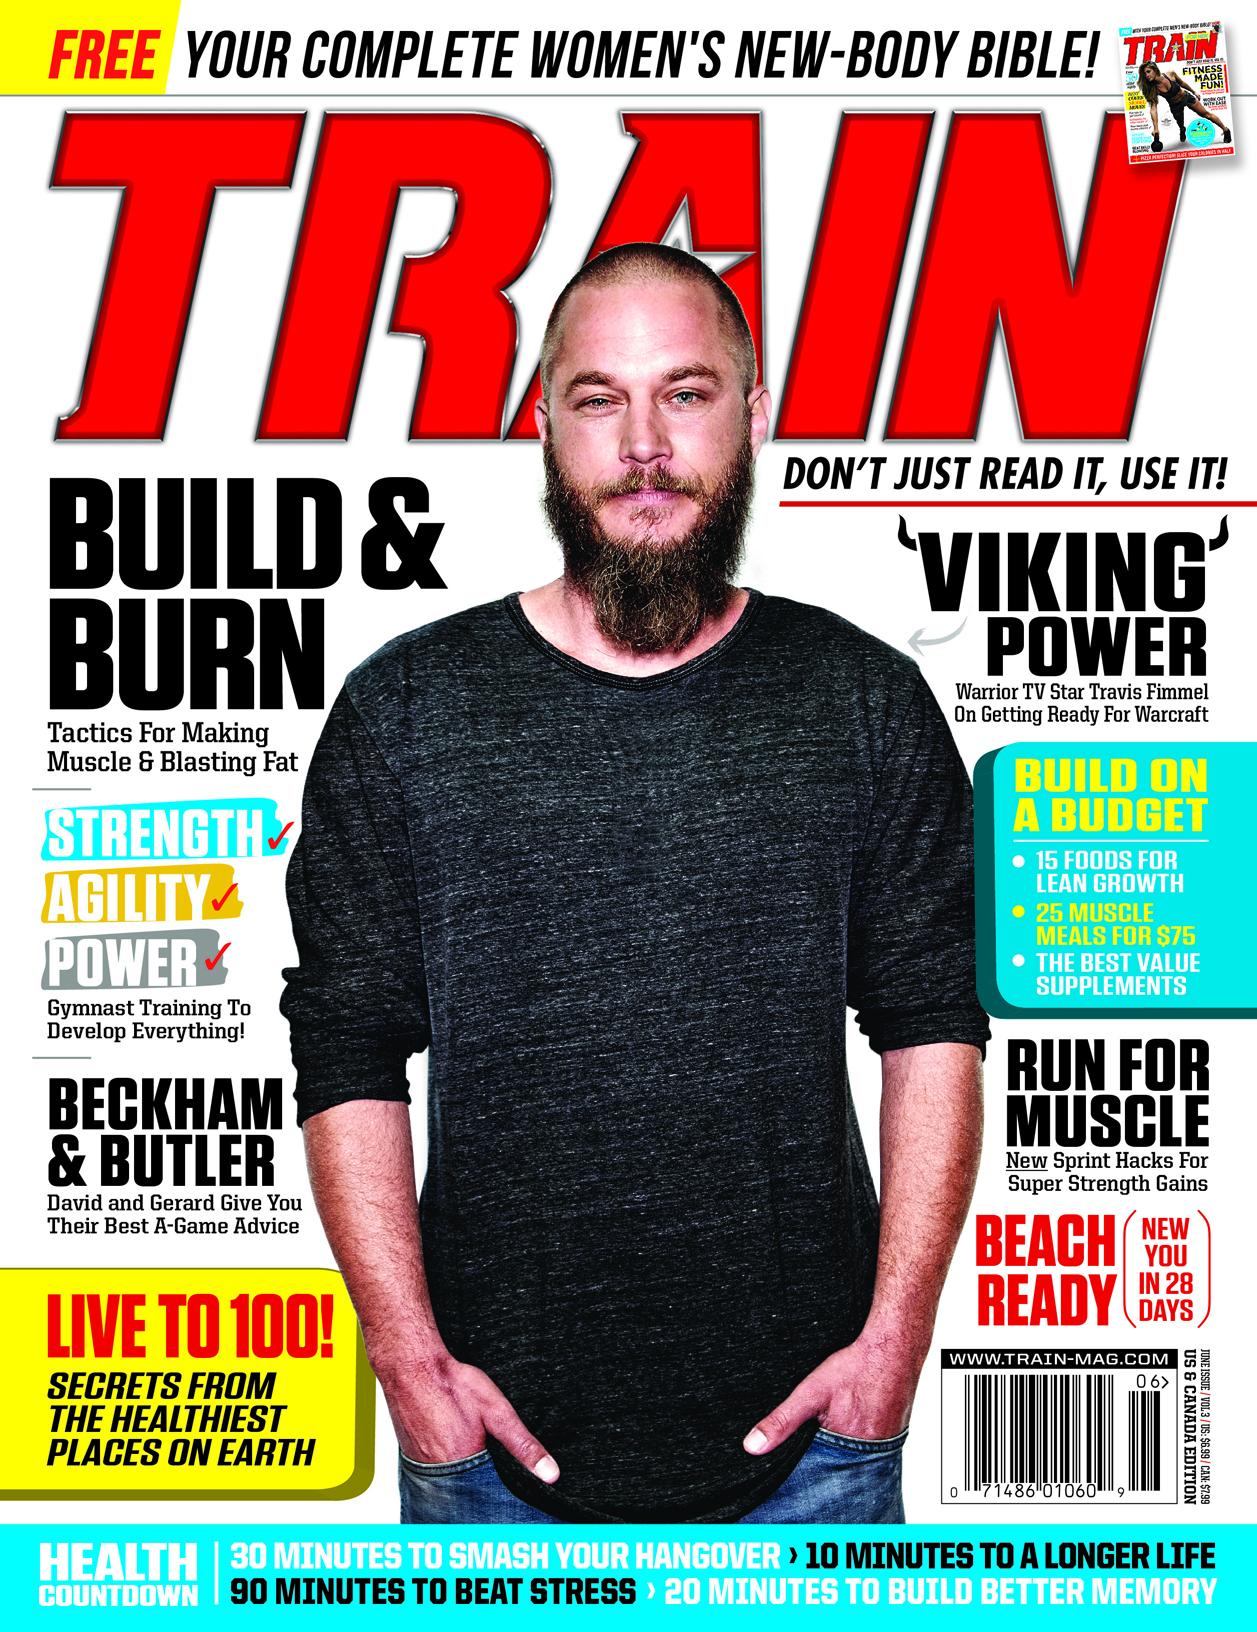 Train Cover.jpg